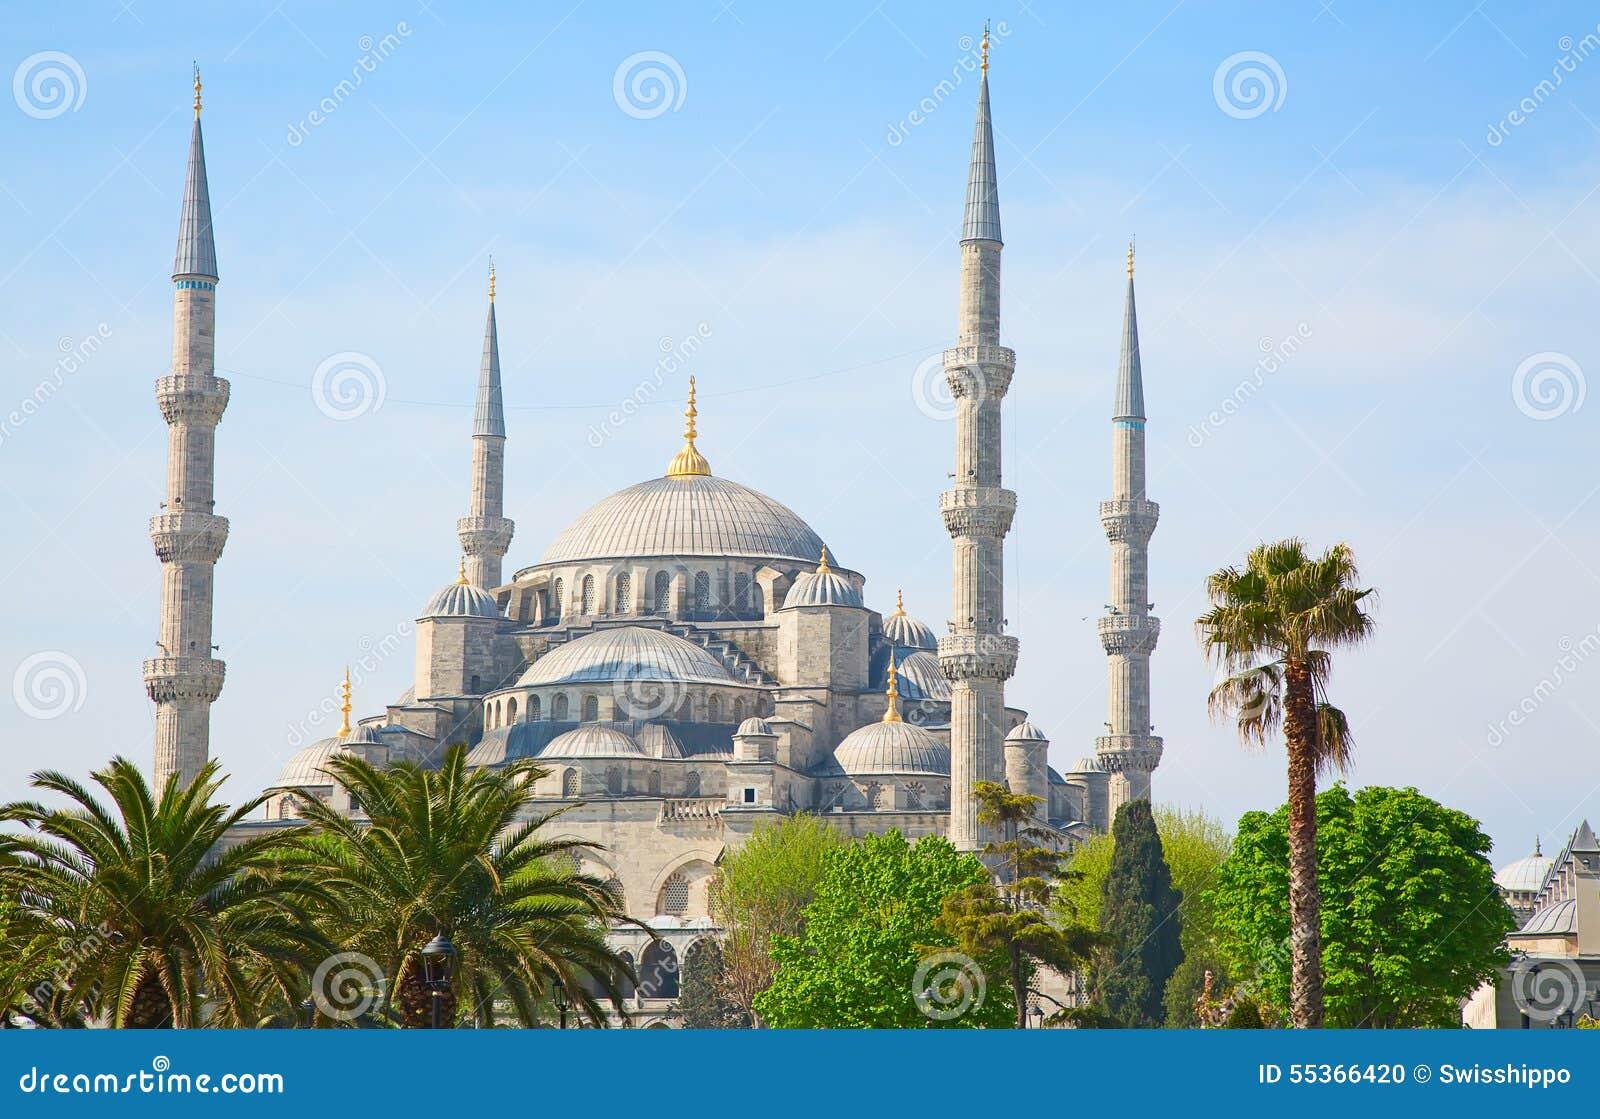 Costantinopoli, Turchia